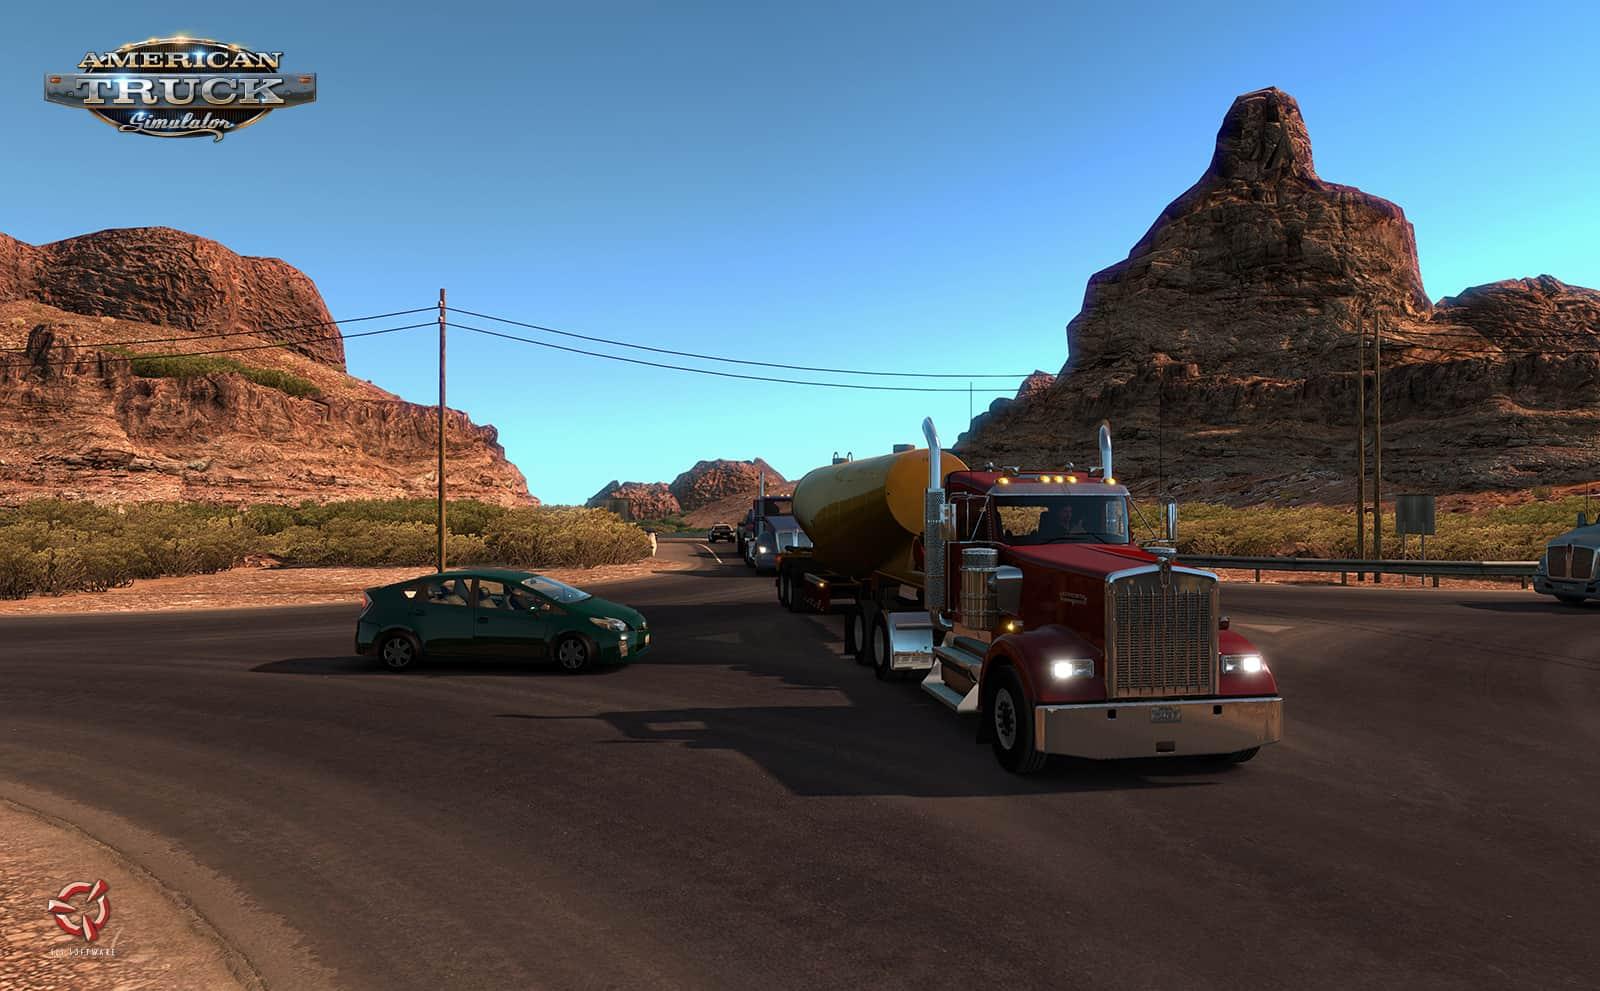 ATS Arizona Teasing - American Truck Simulator mod | ATS mod